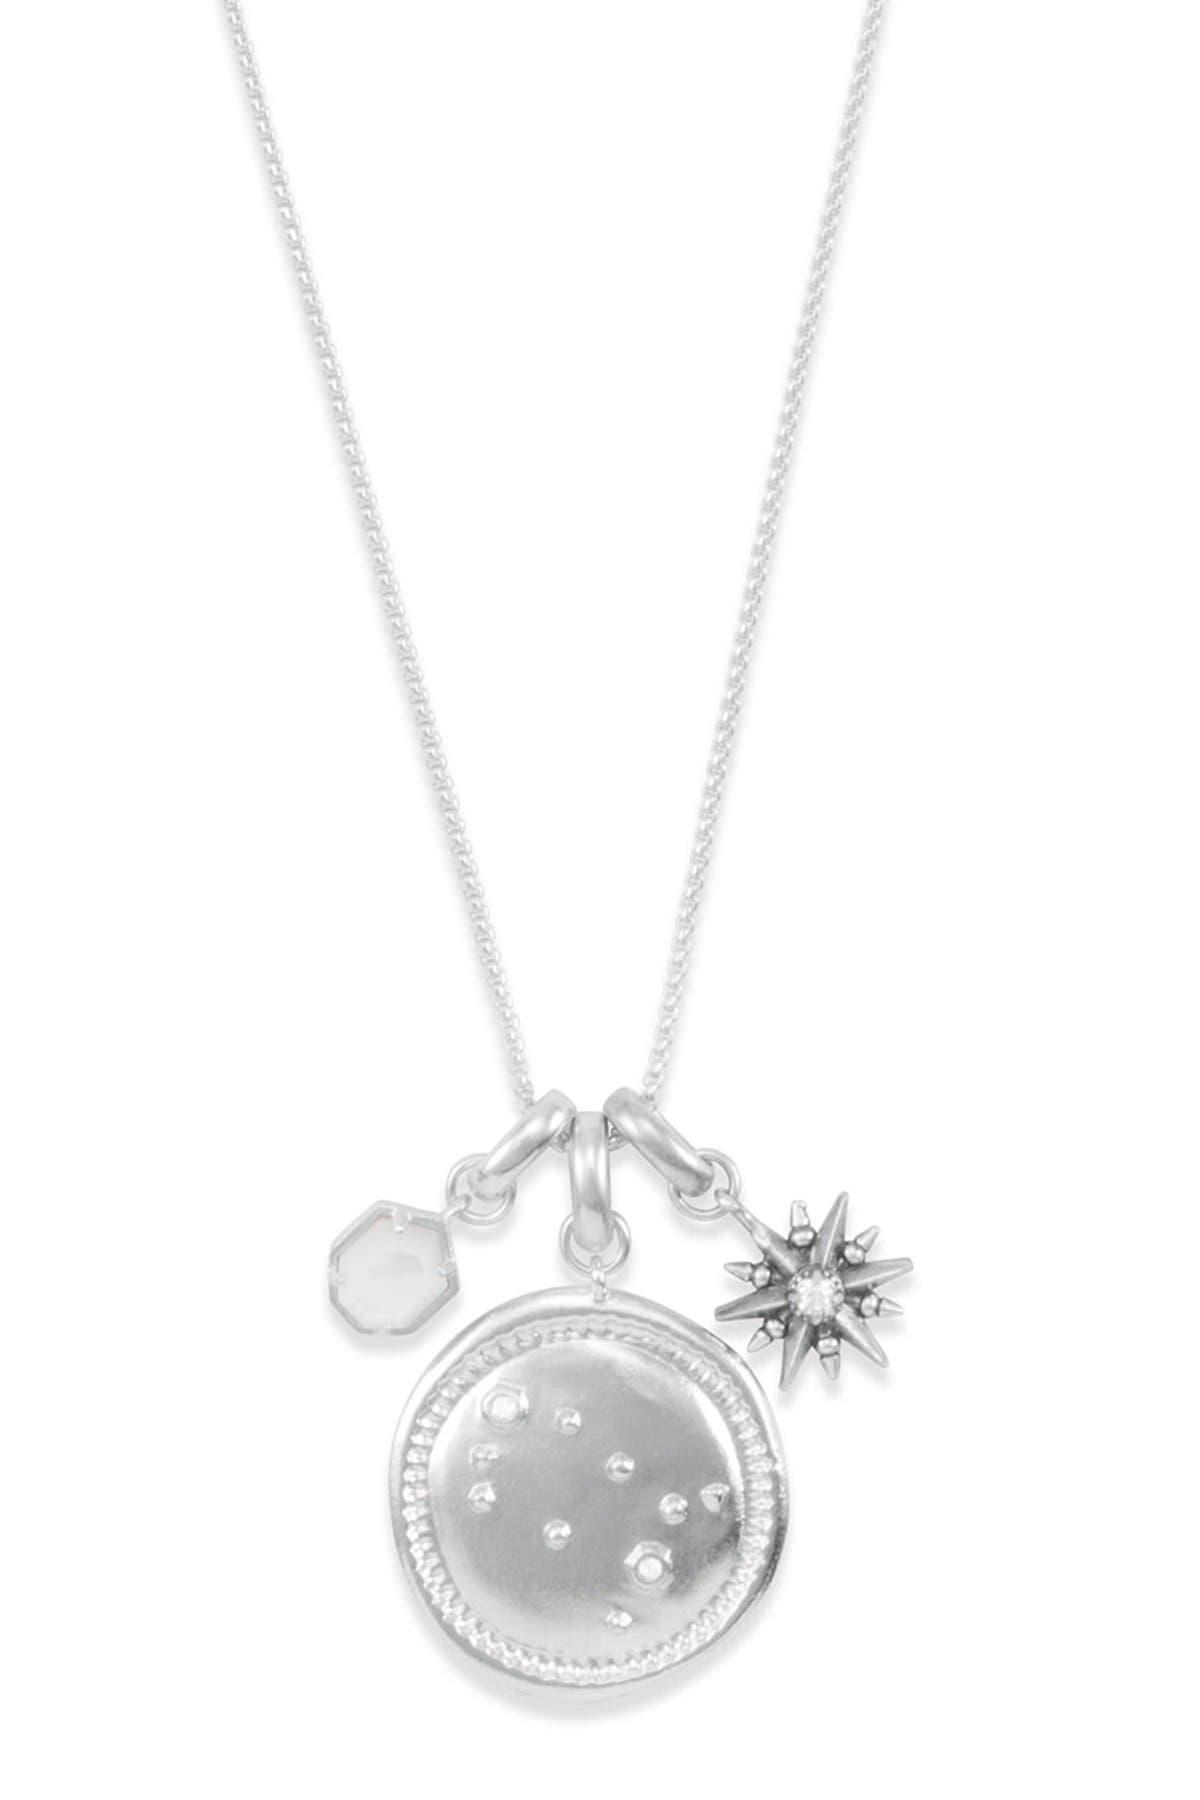 Image of Kendra Scott Rhodium Plated Gemini Charm Necklace